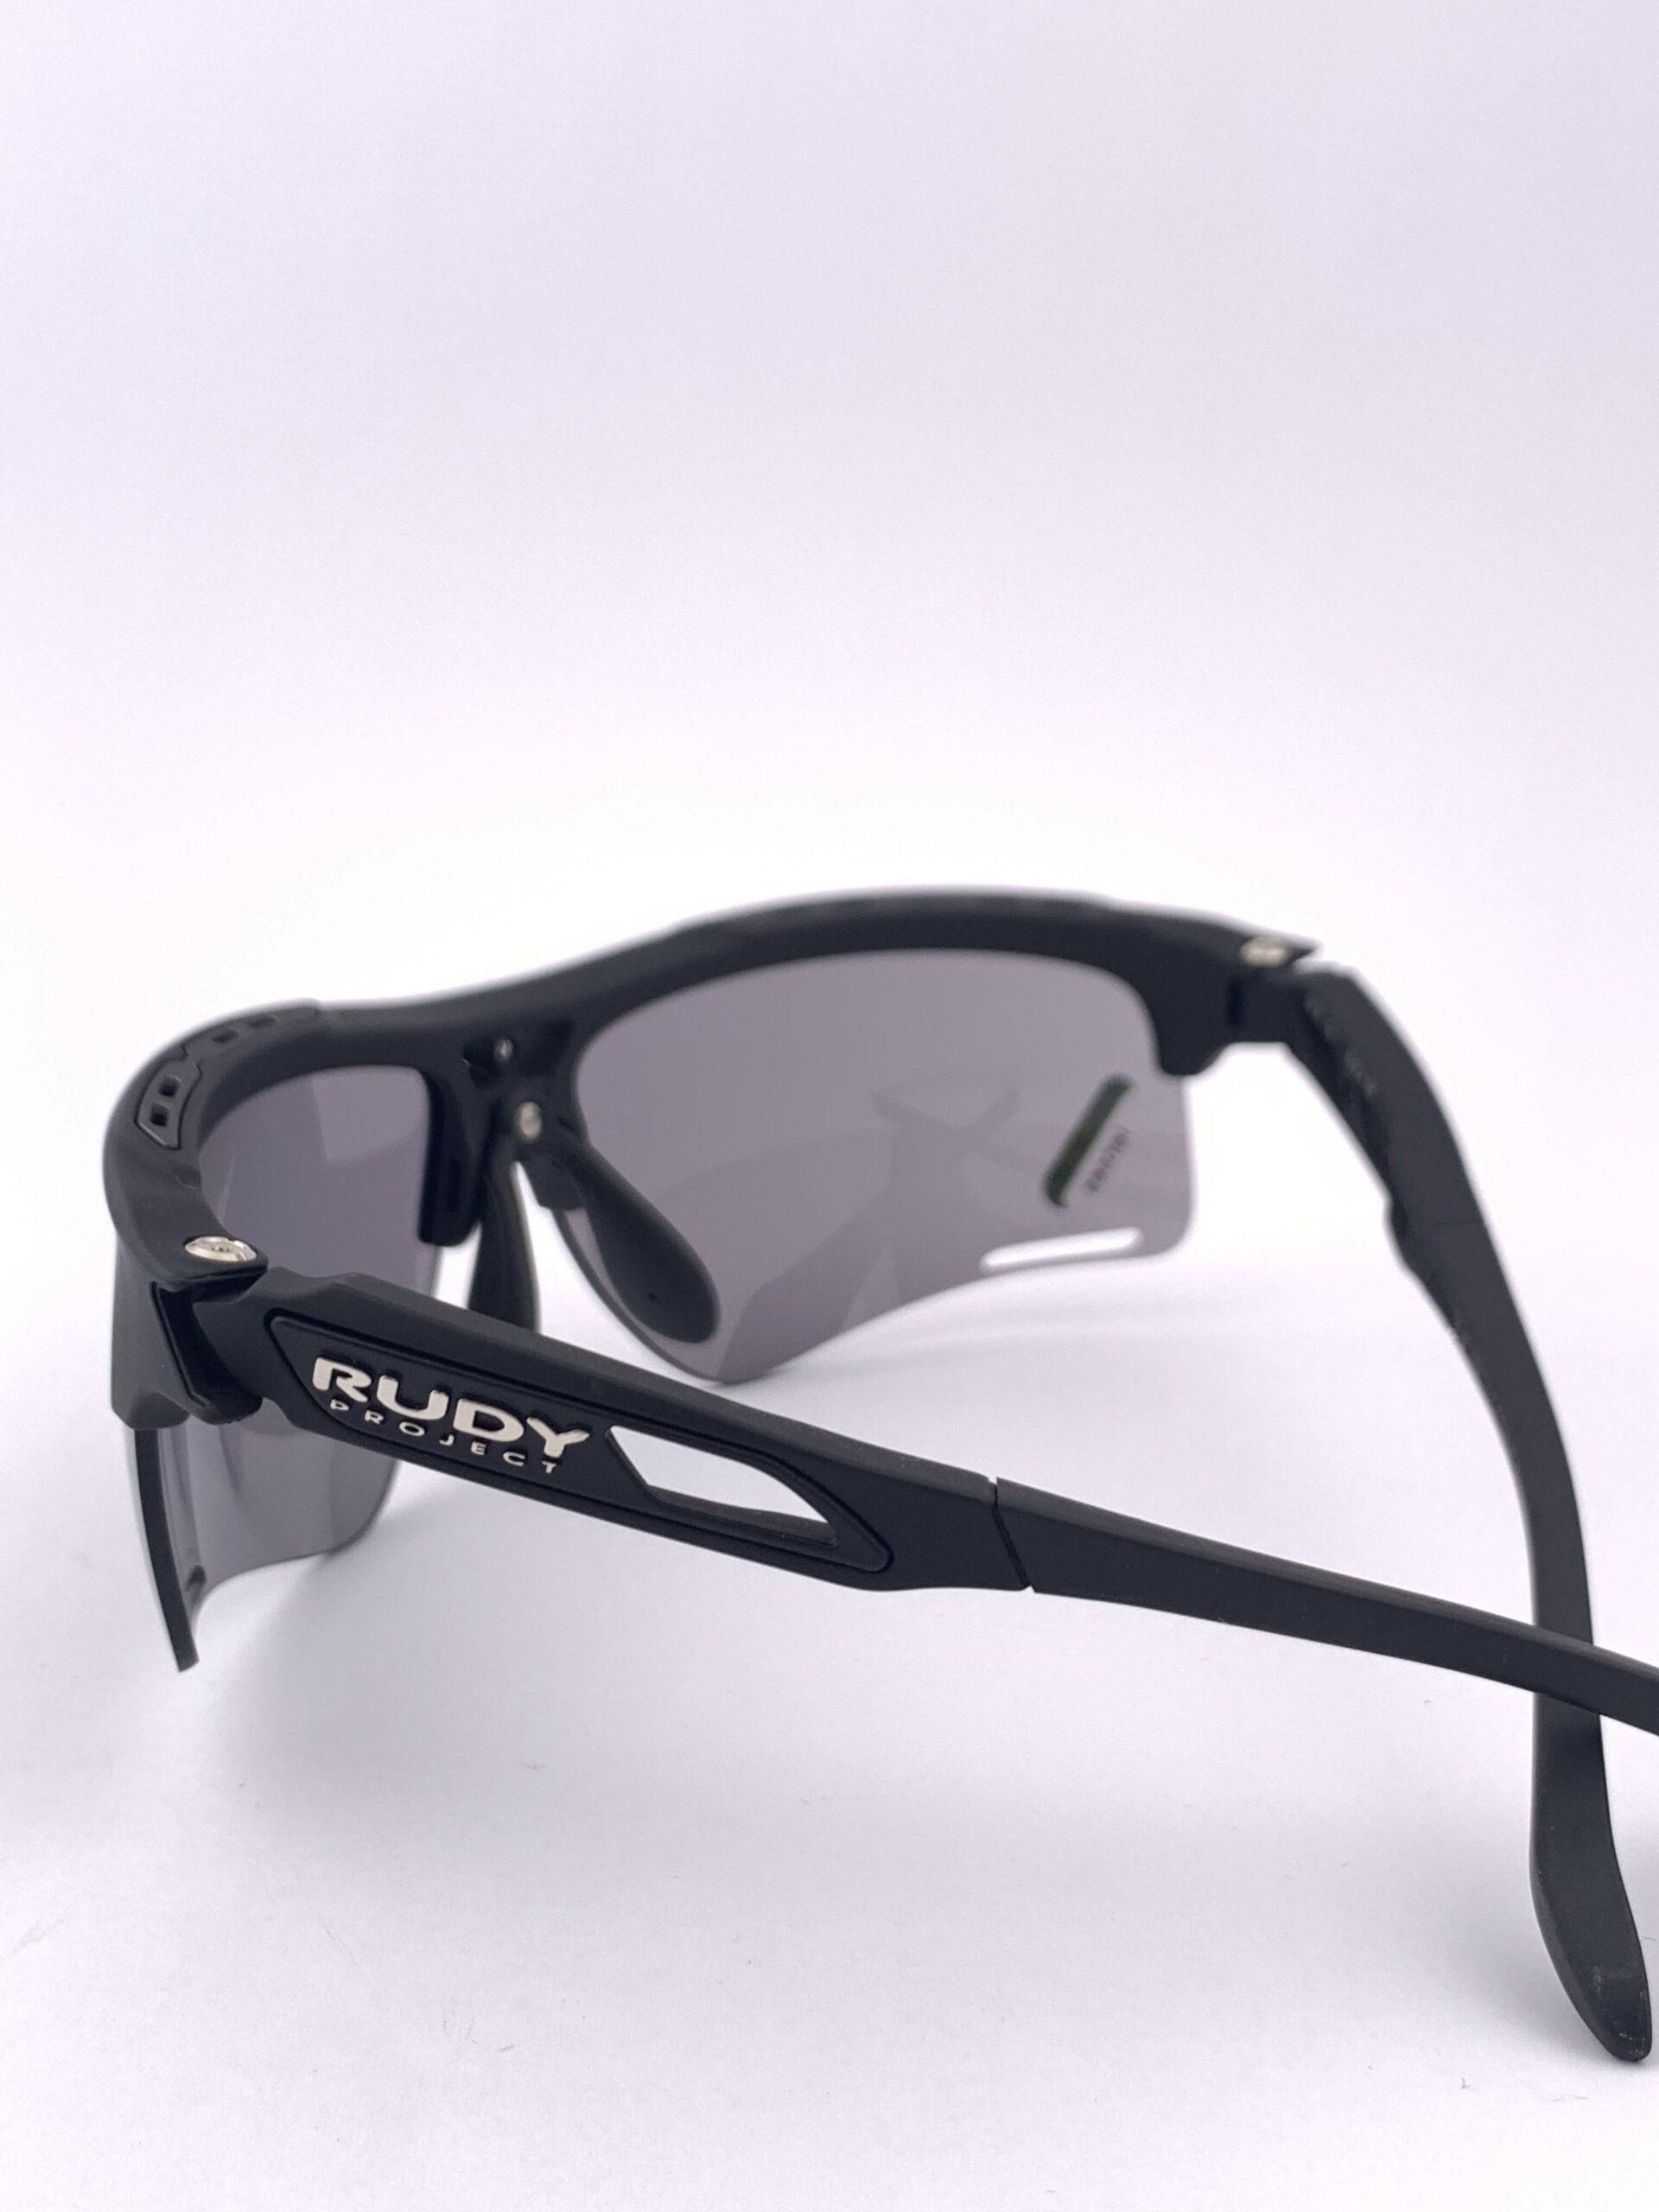 Cyklistické okuliare Keyblade čierne zozadu